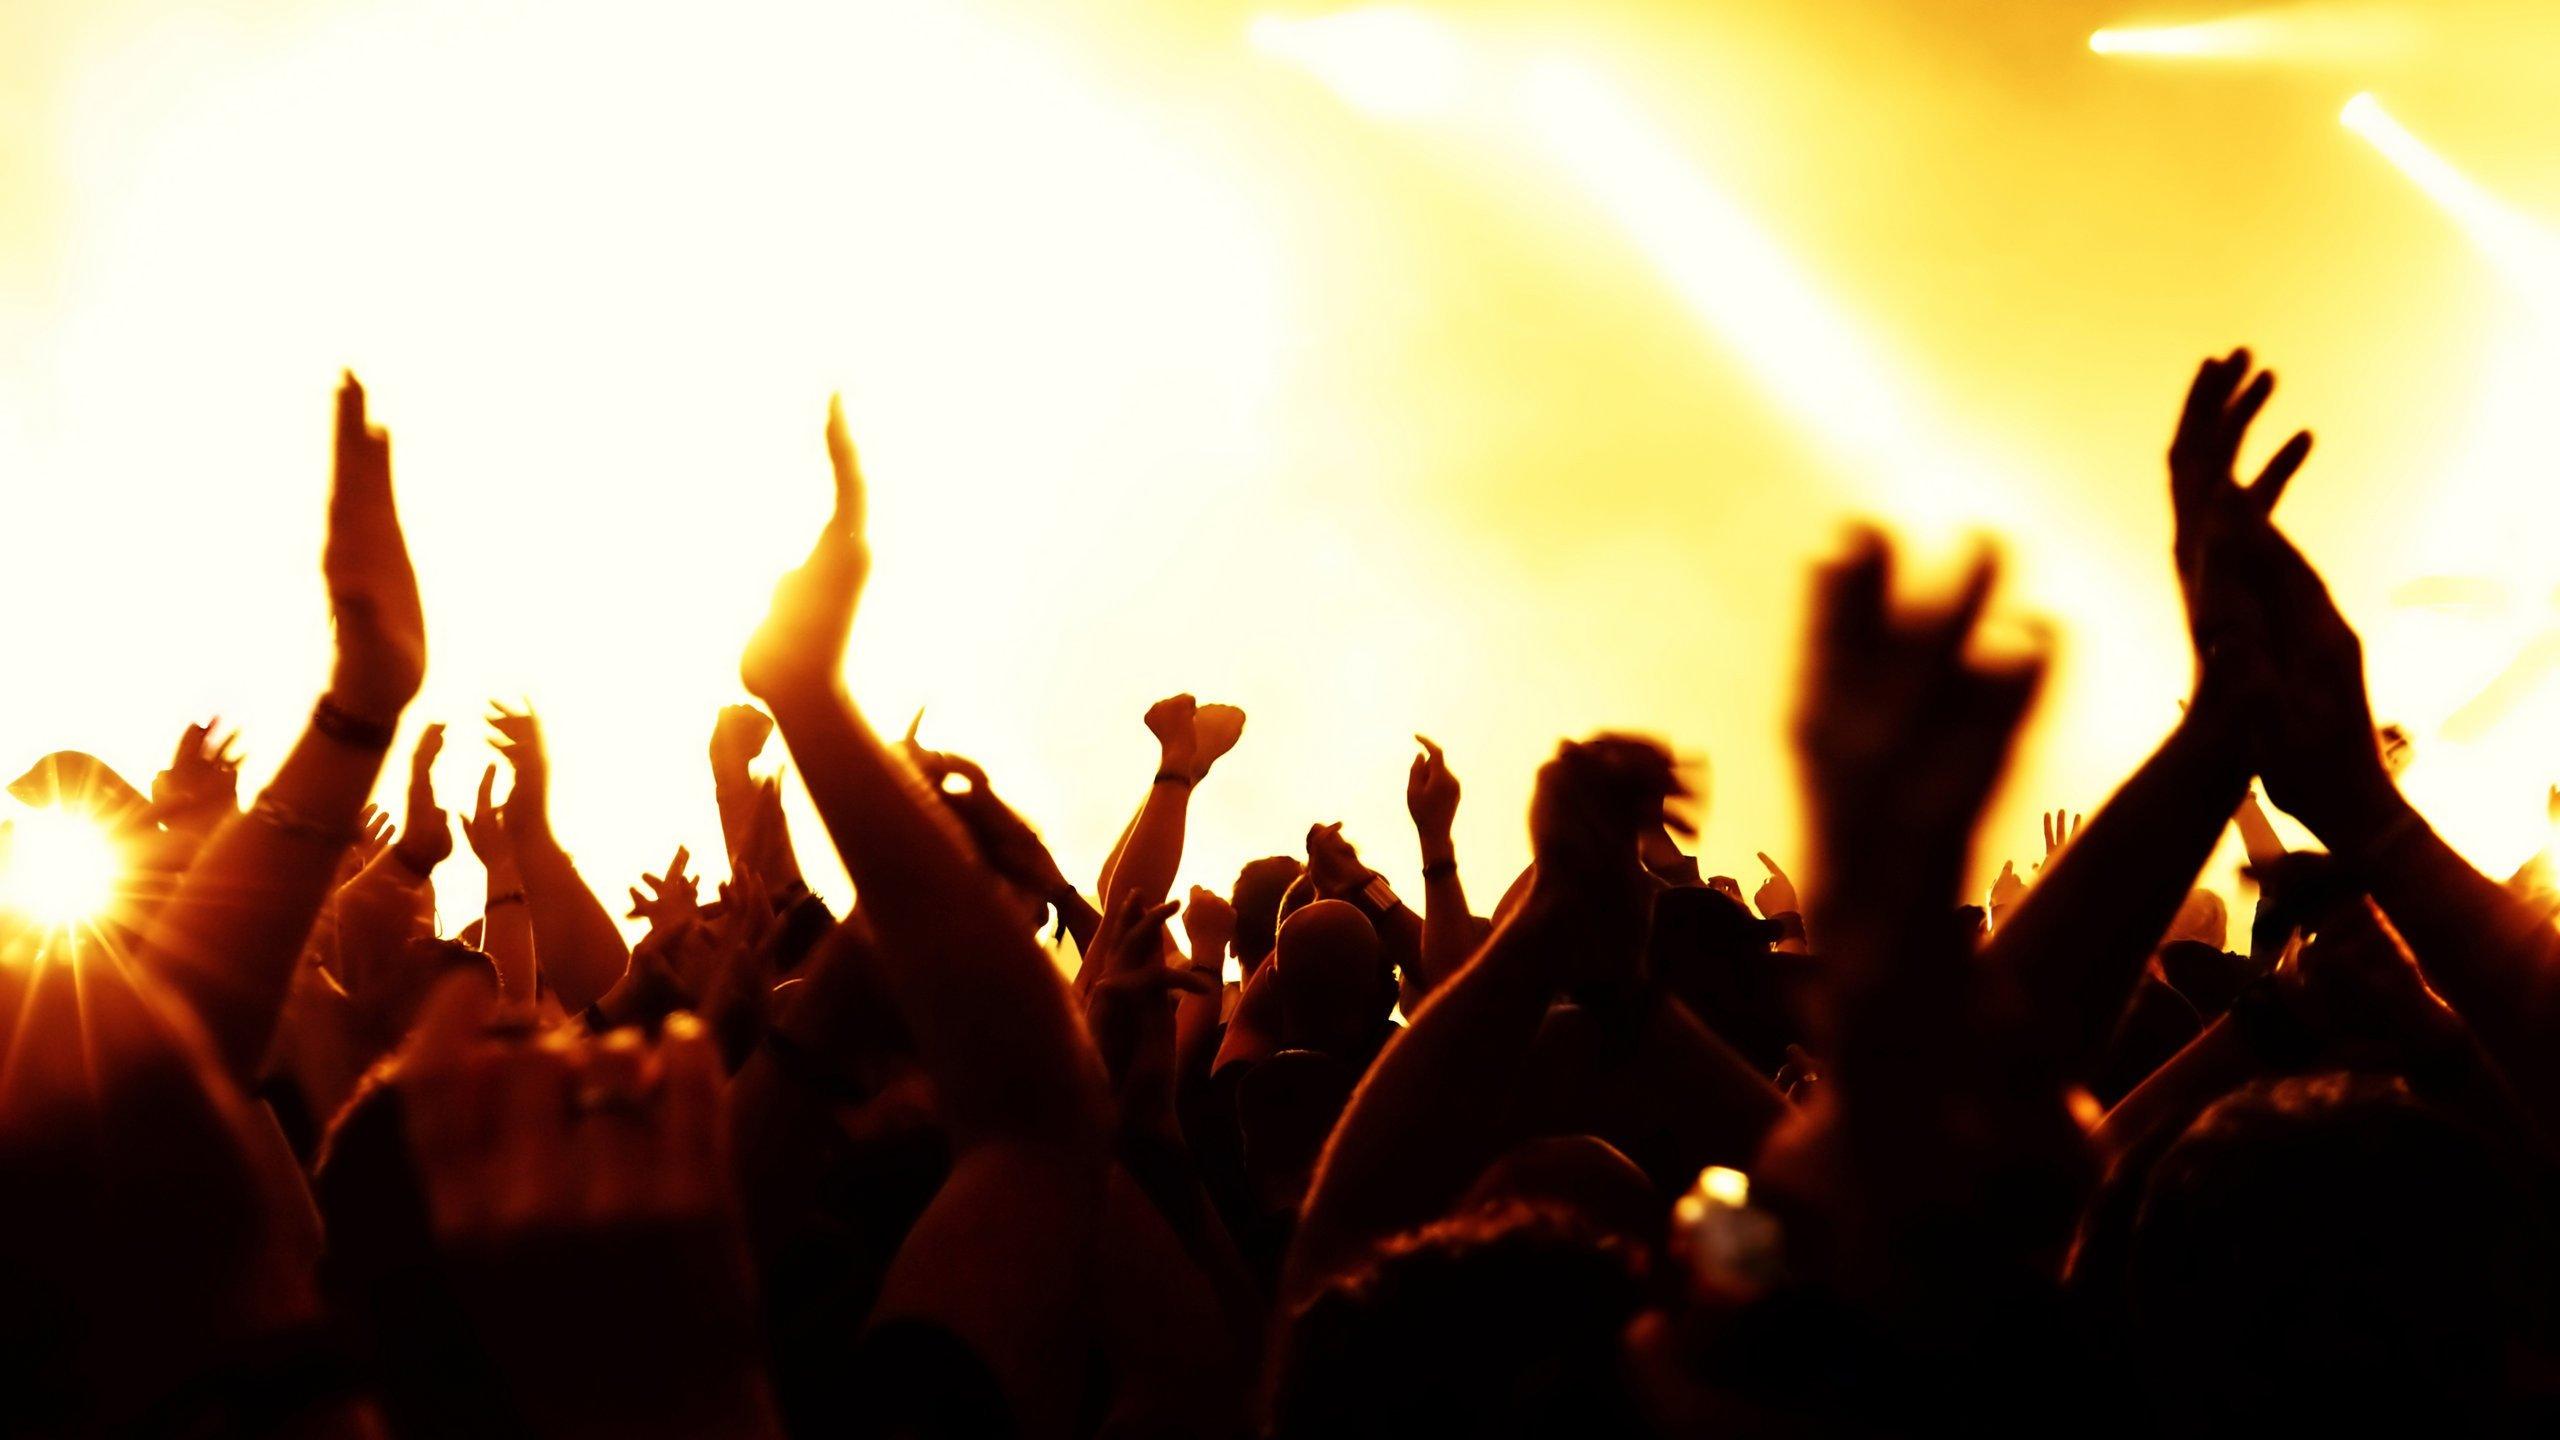 concert_promotion_show_bands_artists_independent_diy_marketing_ideas